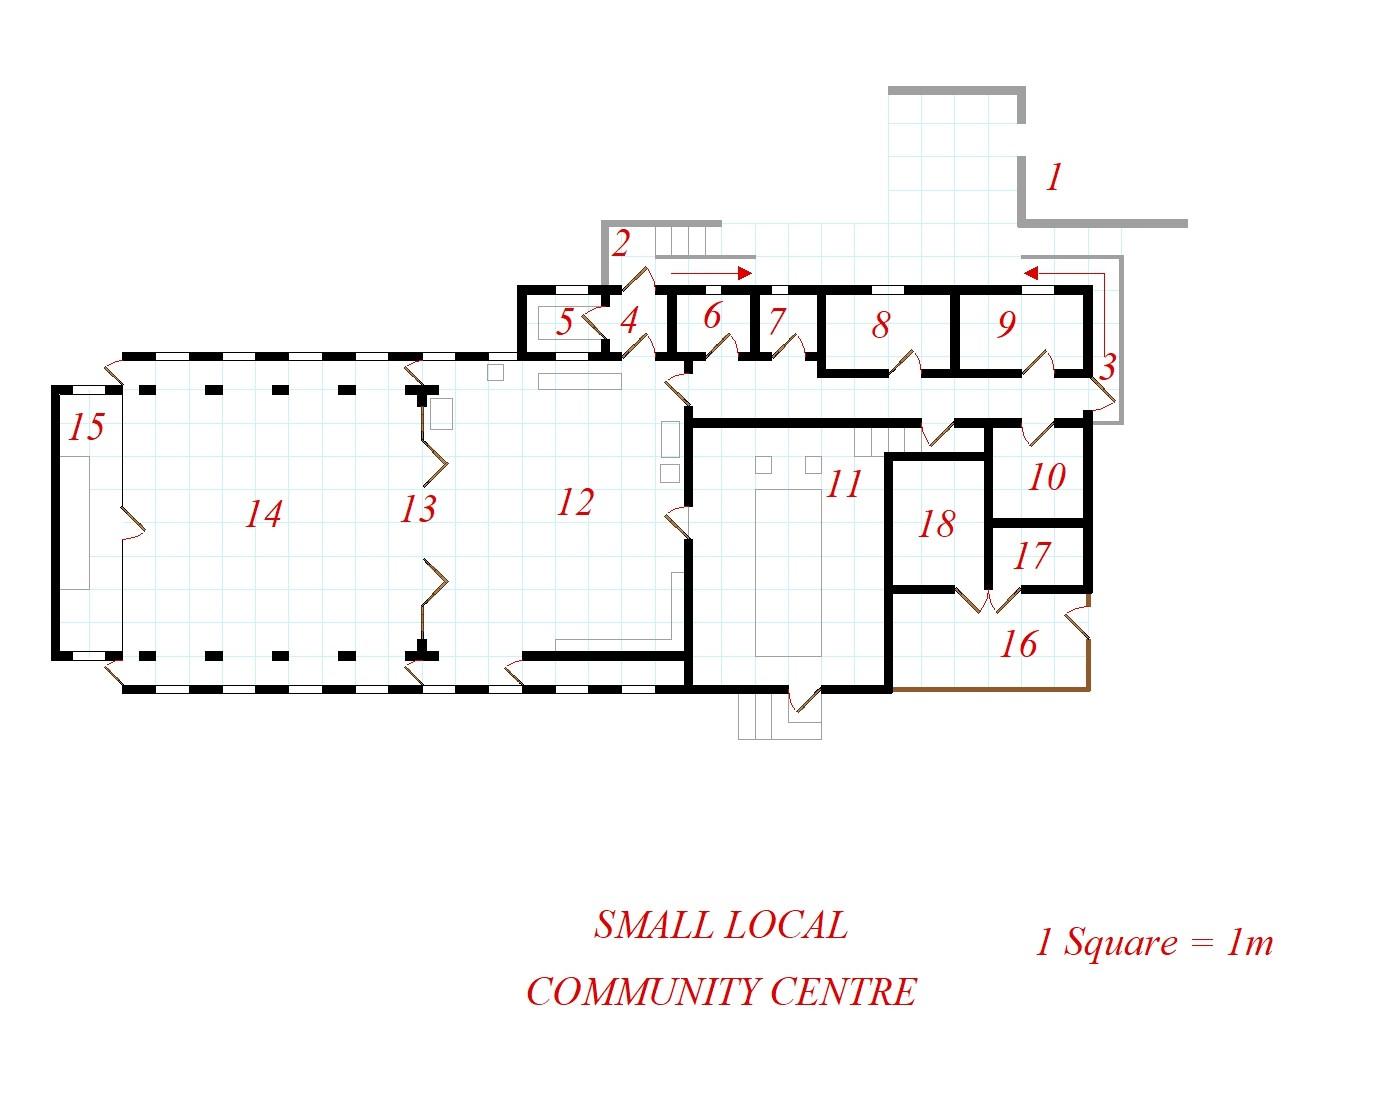 Freebie Small Local Community Centre Map Gethsemane Games